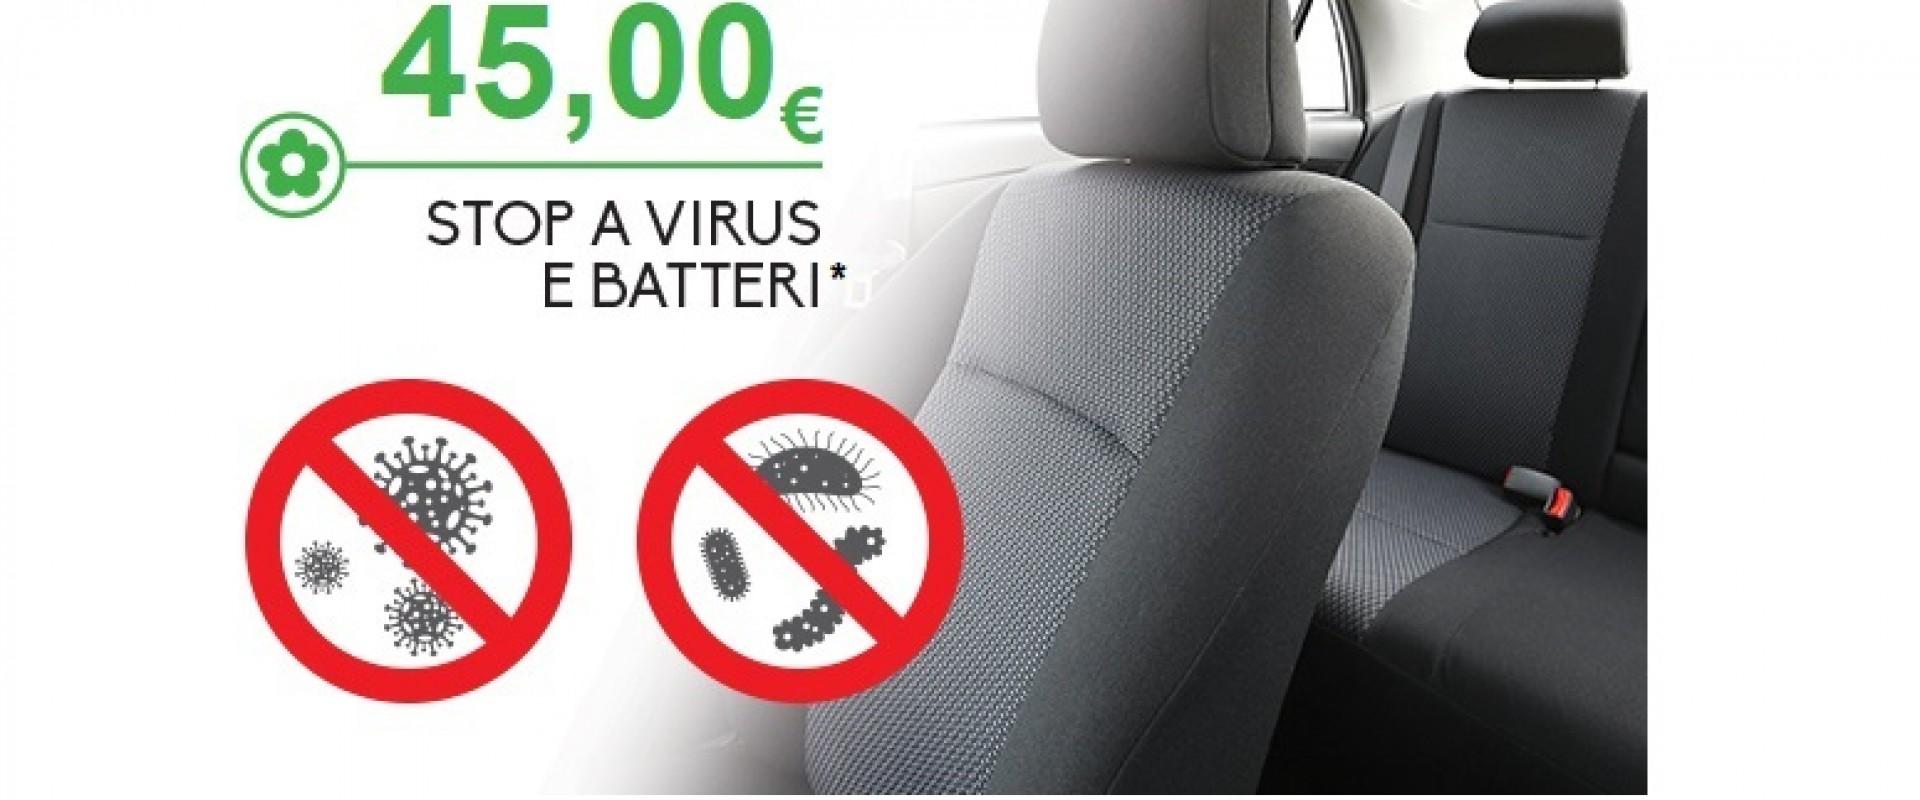 STOP A VIRUS E BATTERI